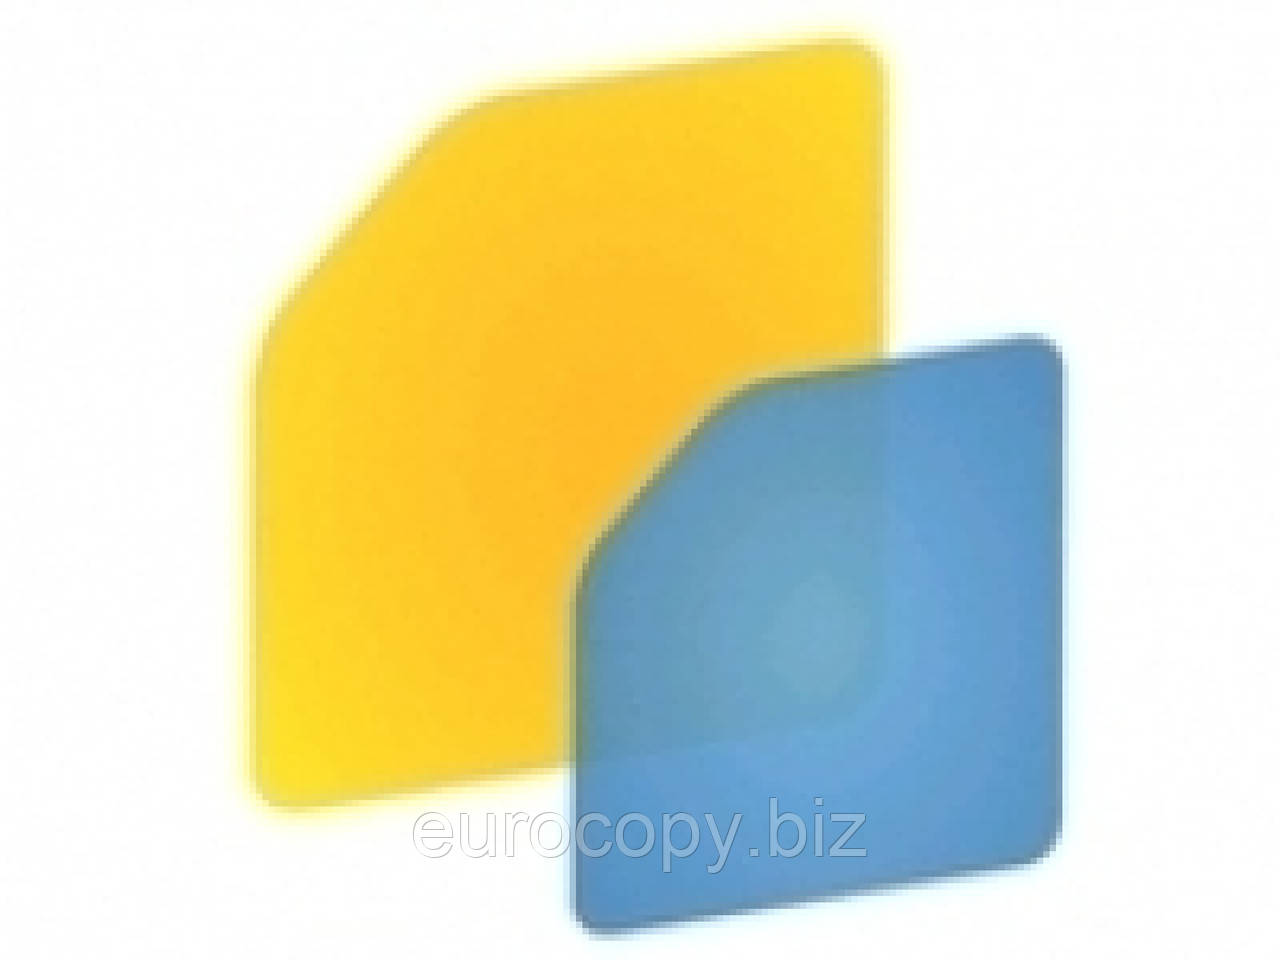 Драм-картридж OKI EP-CART-C-C8600 (43449015)